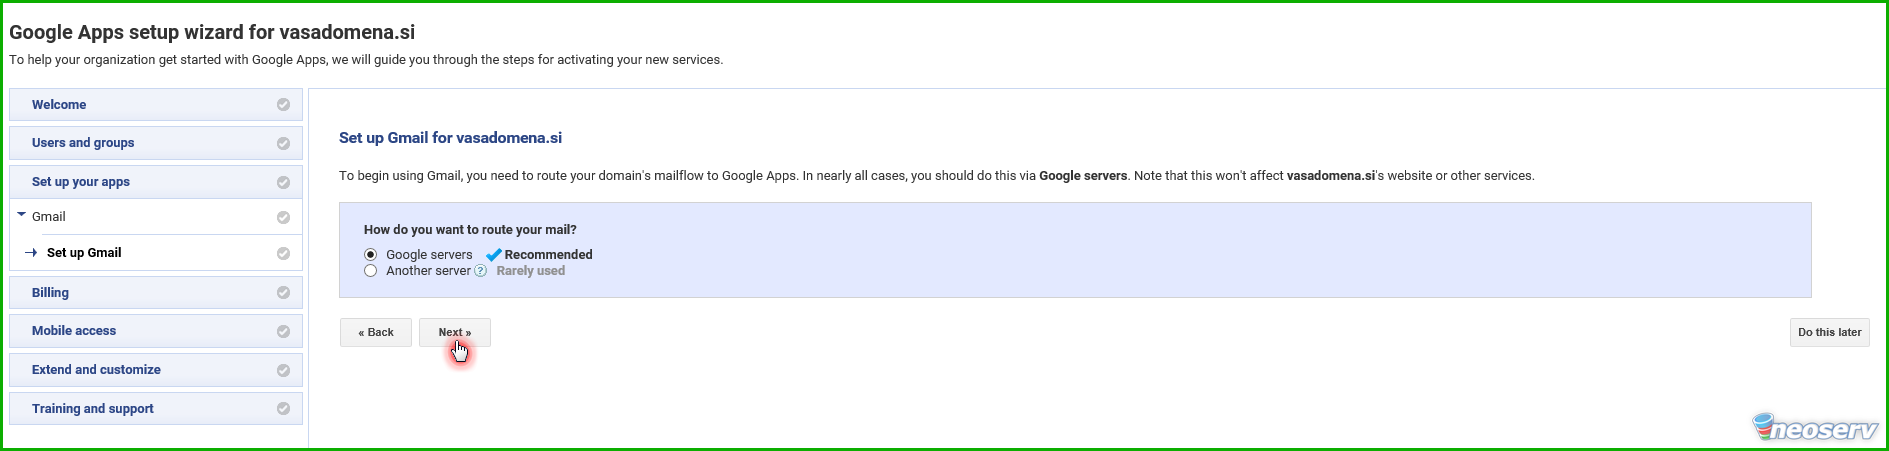 izberete_gmail_googe_servers